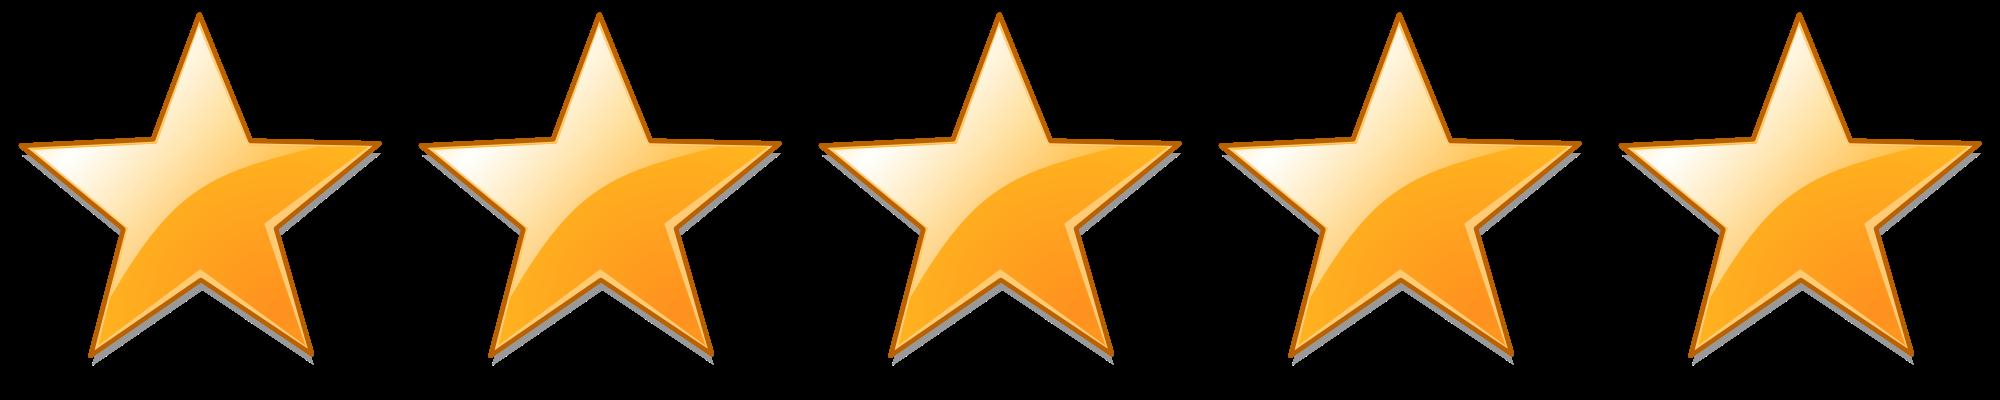 Five Star Review - Tannan Plastic Surgery